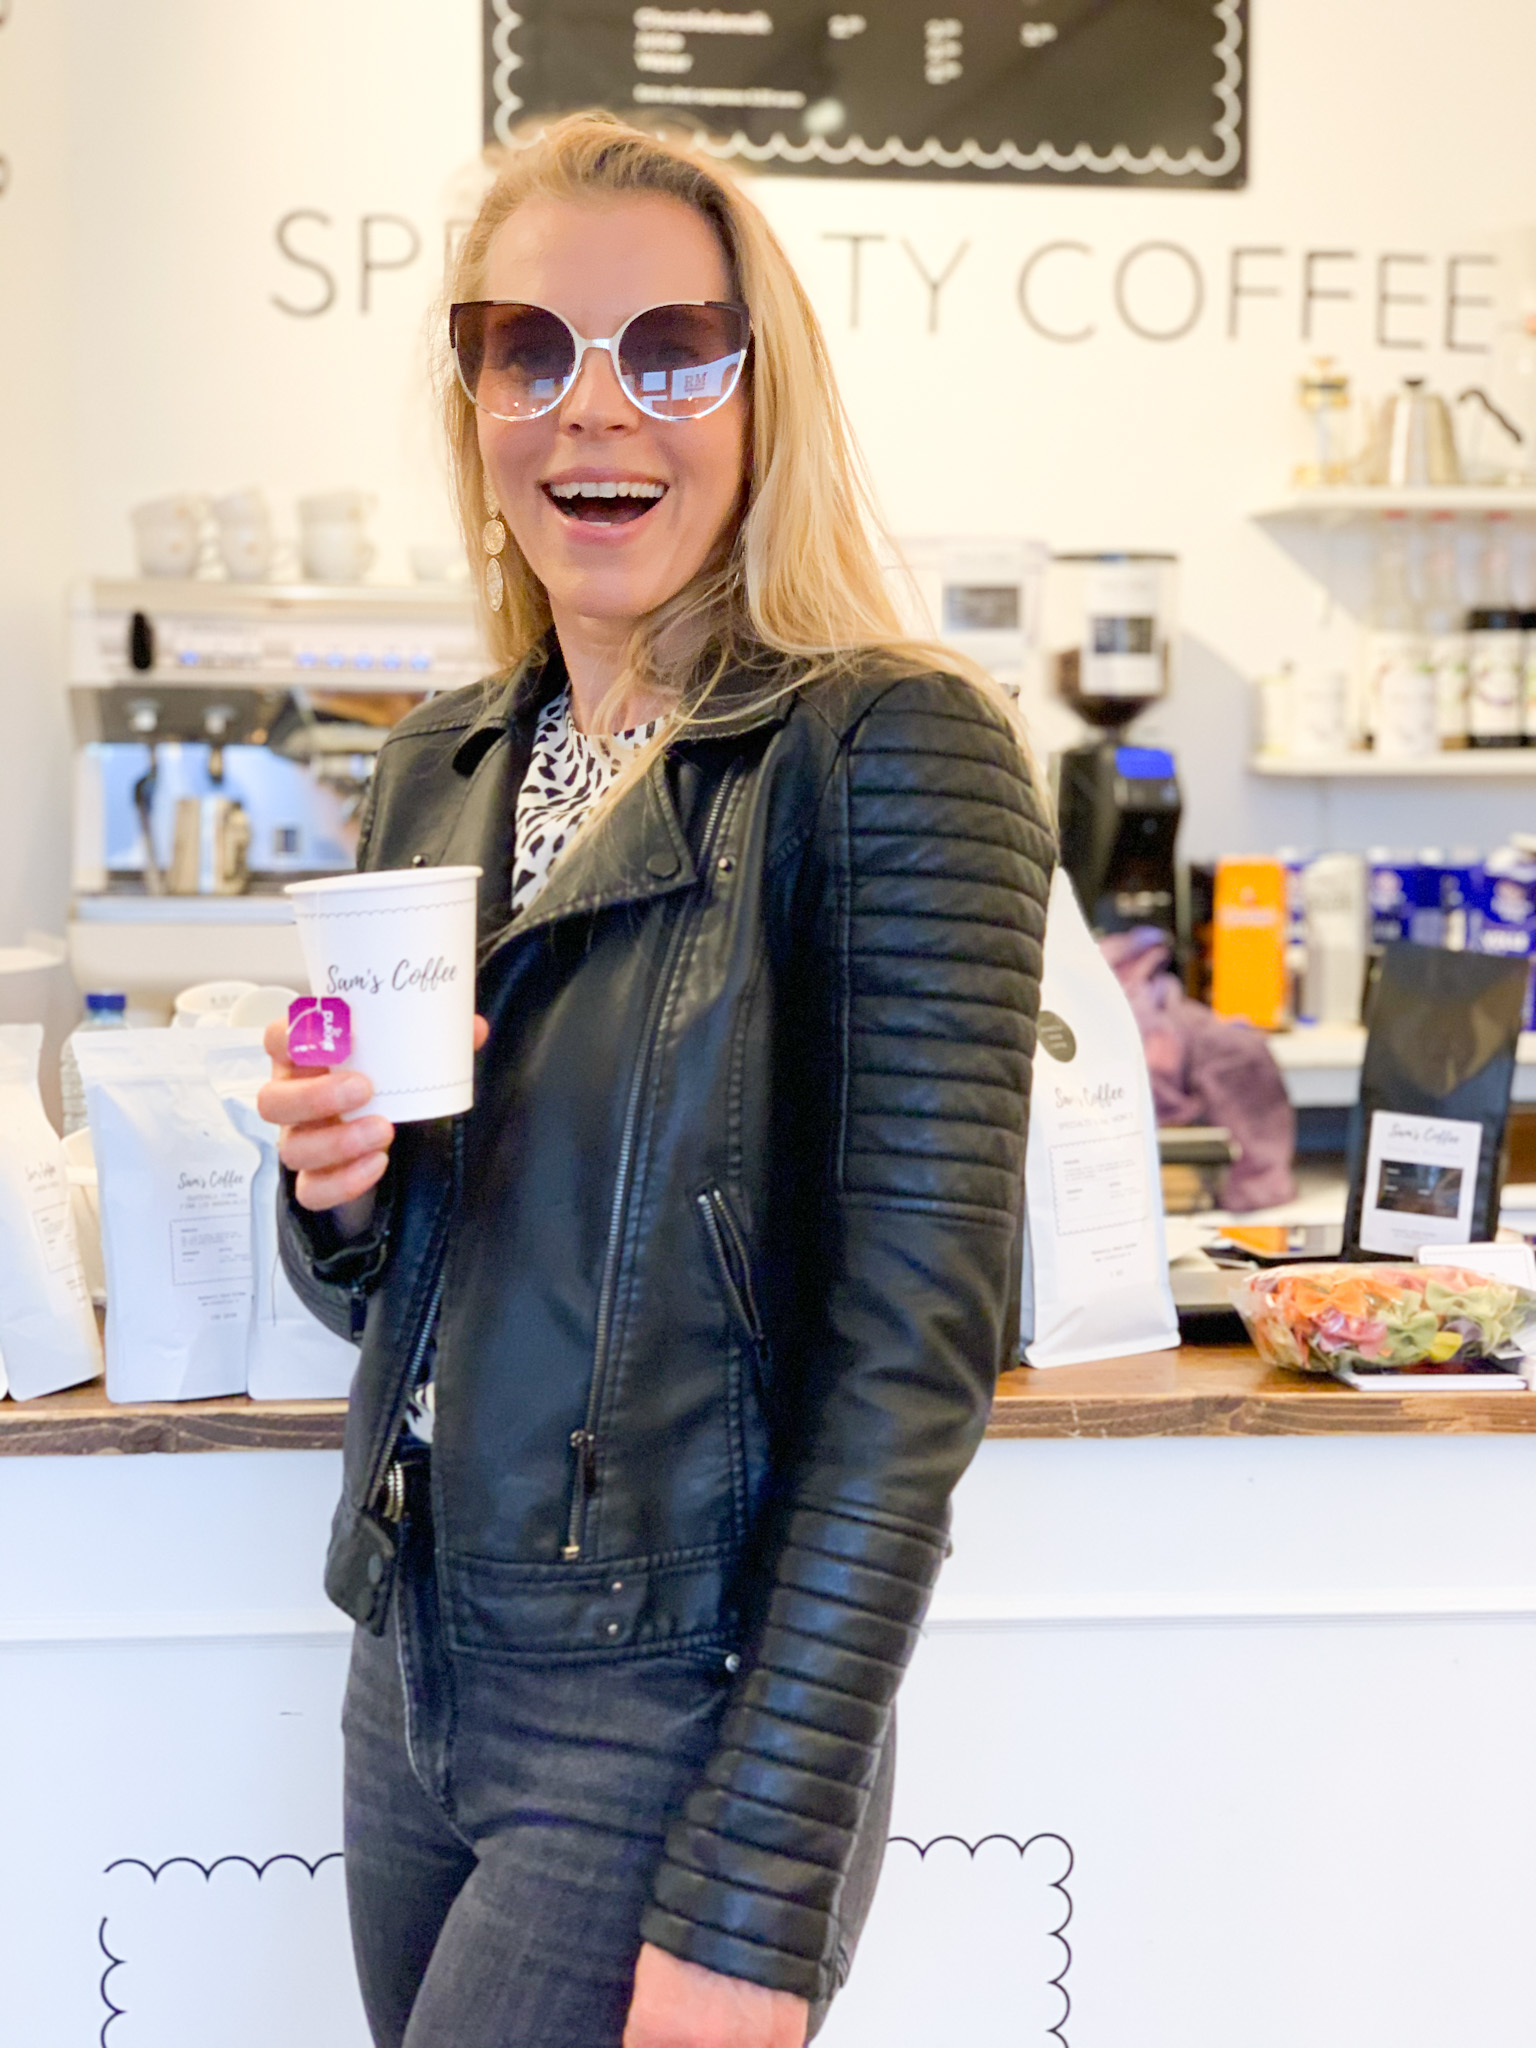 Sam's coffee